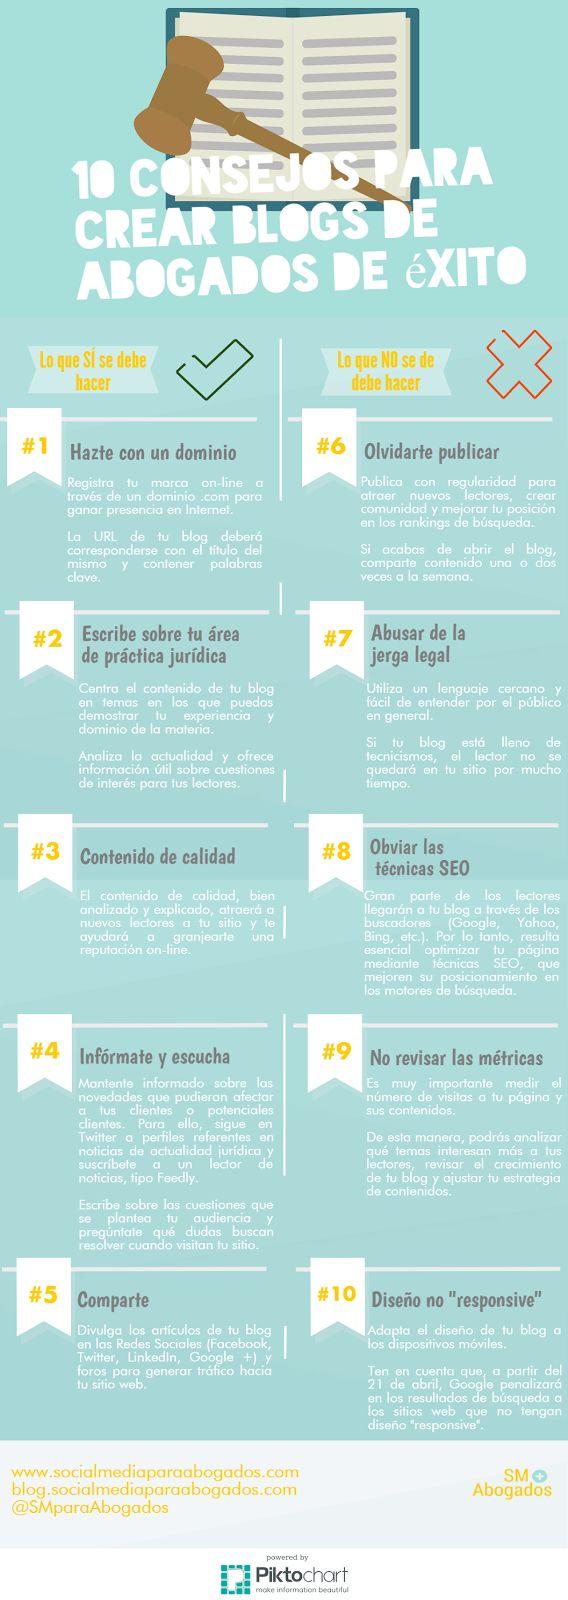 Hola: Una infografía con 10 consejos para crear un blog de éxito para abogados. Vía Un saludo